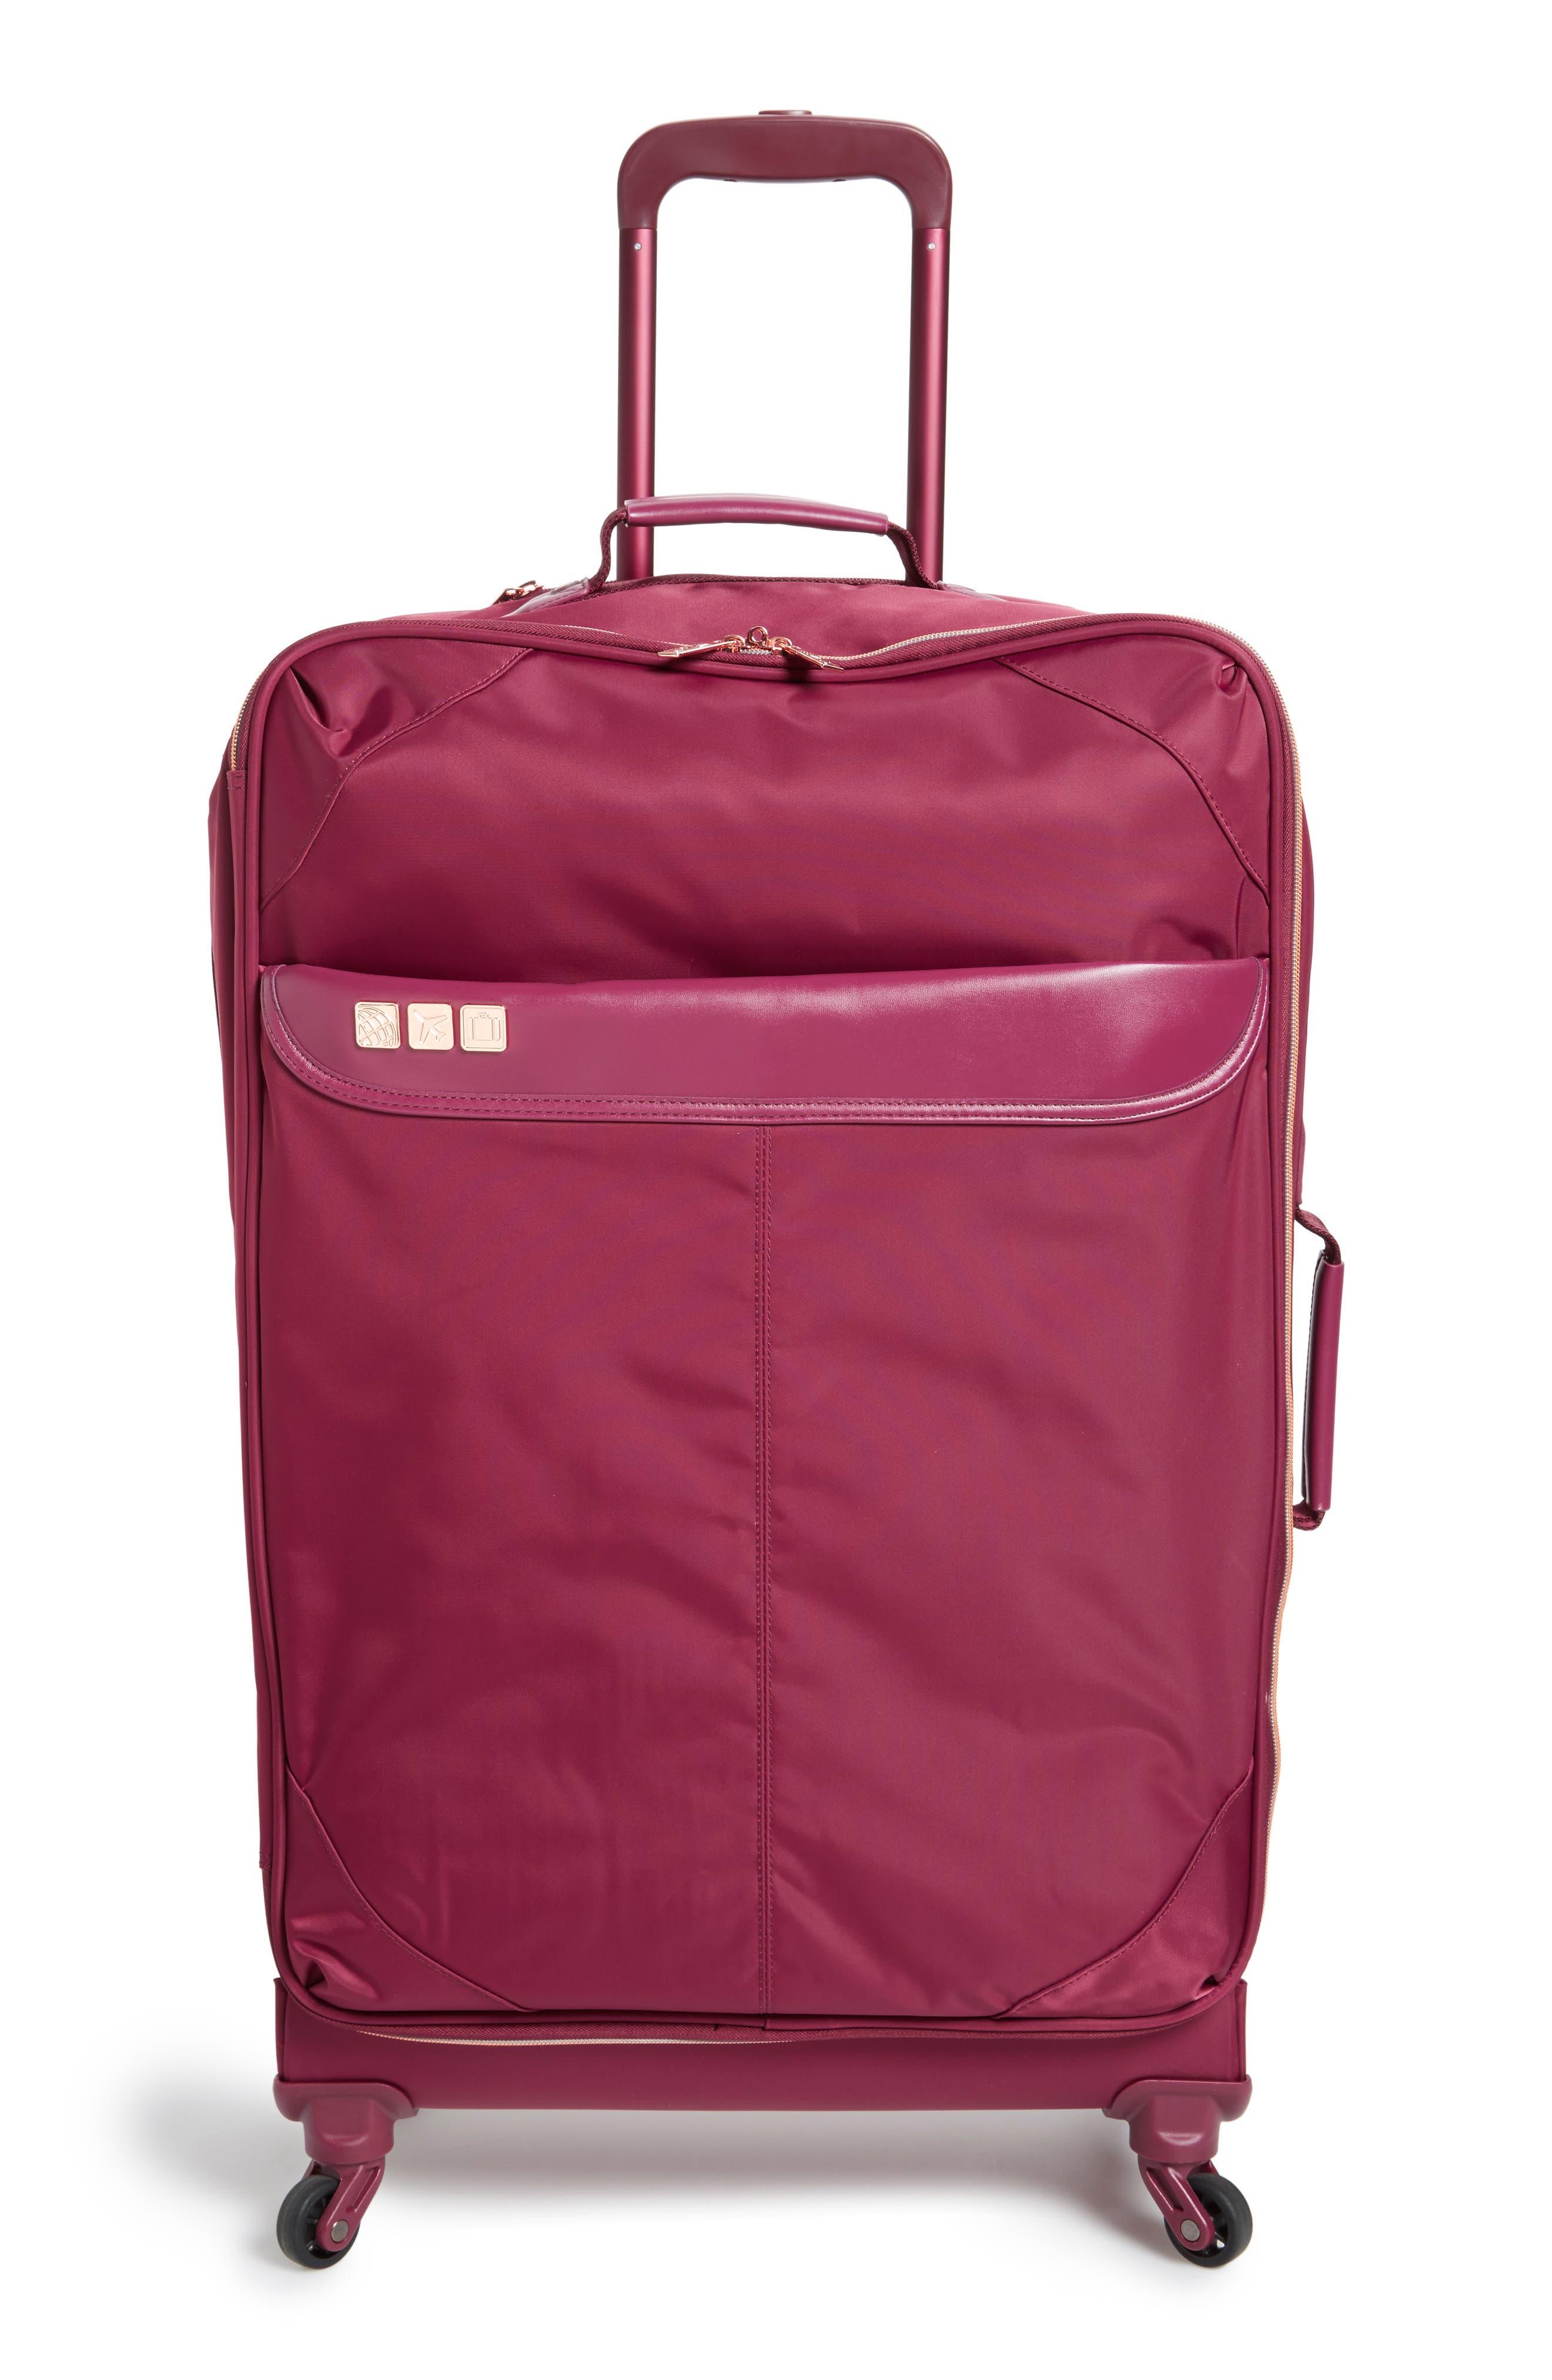 Alternate Image 1 Selected - Flight 001 Avionette 26 Inch Rolling Suitcase